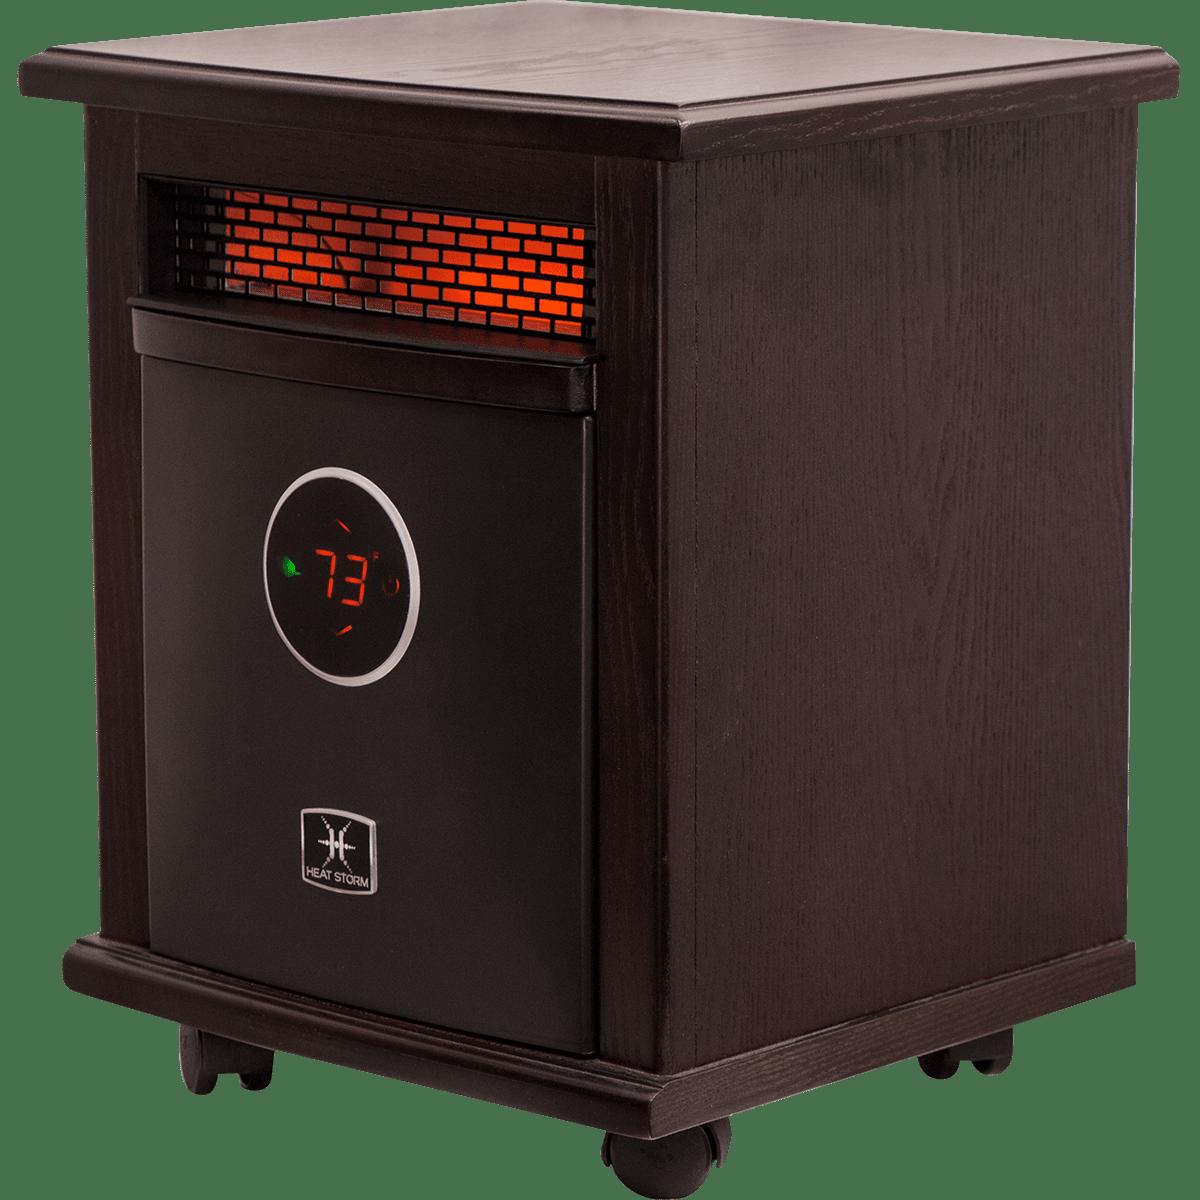 Heat Storm Logan 1500-Watt Infrared Quartz Space Heater